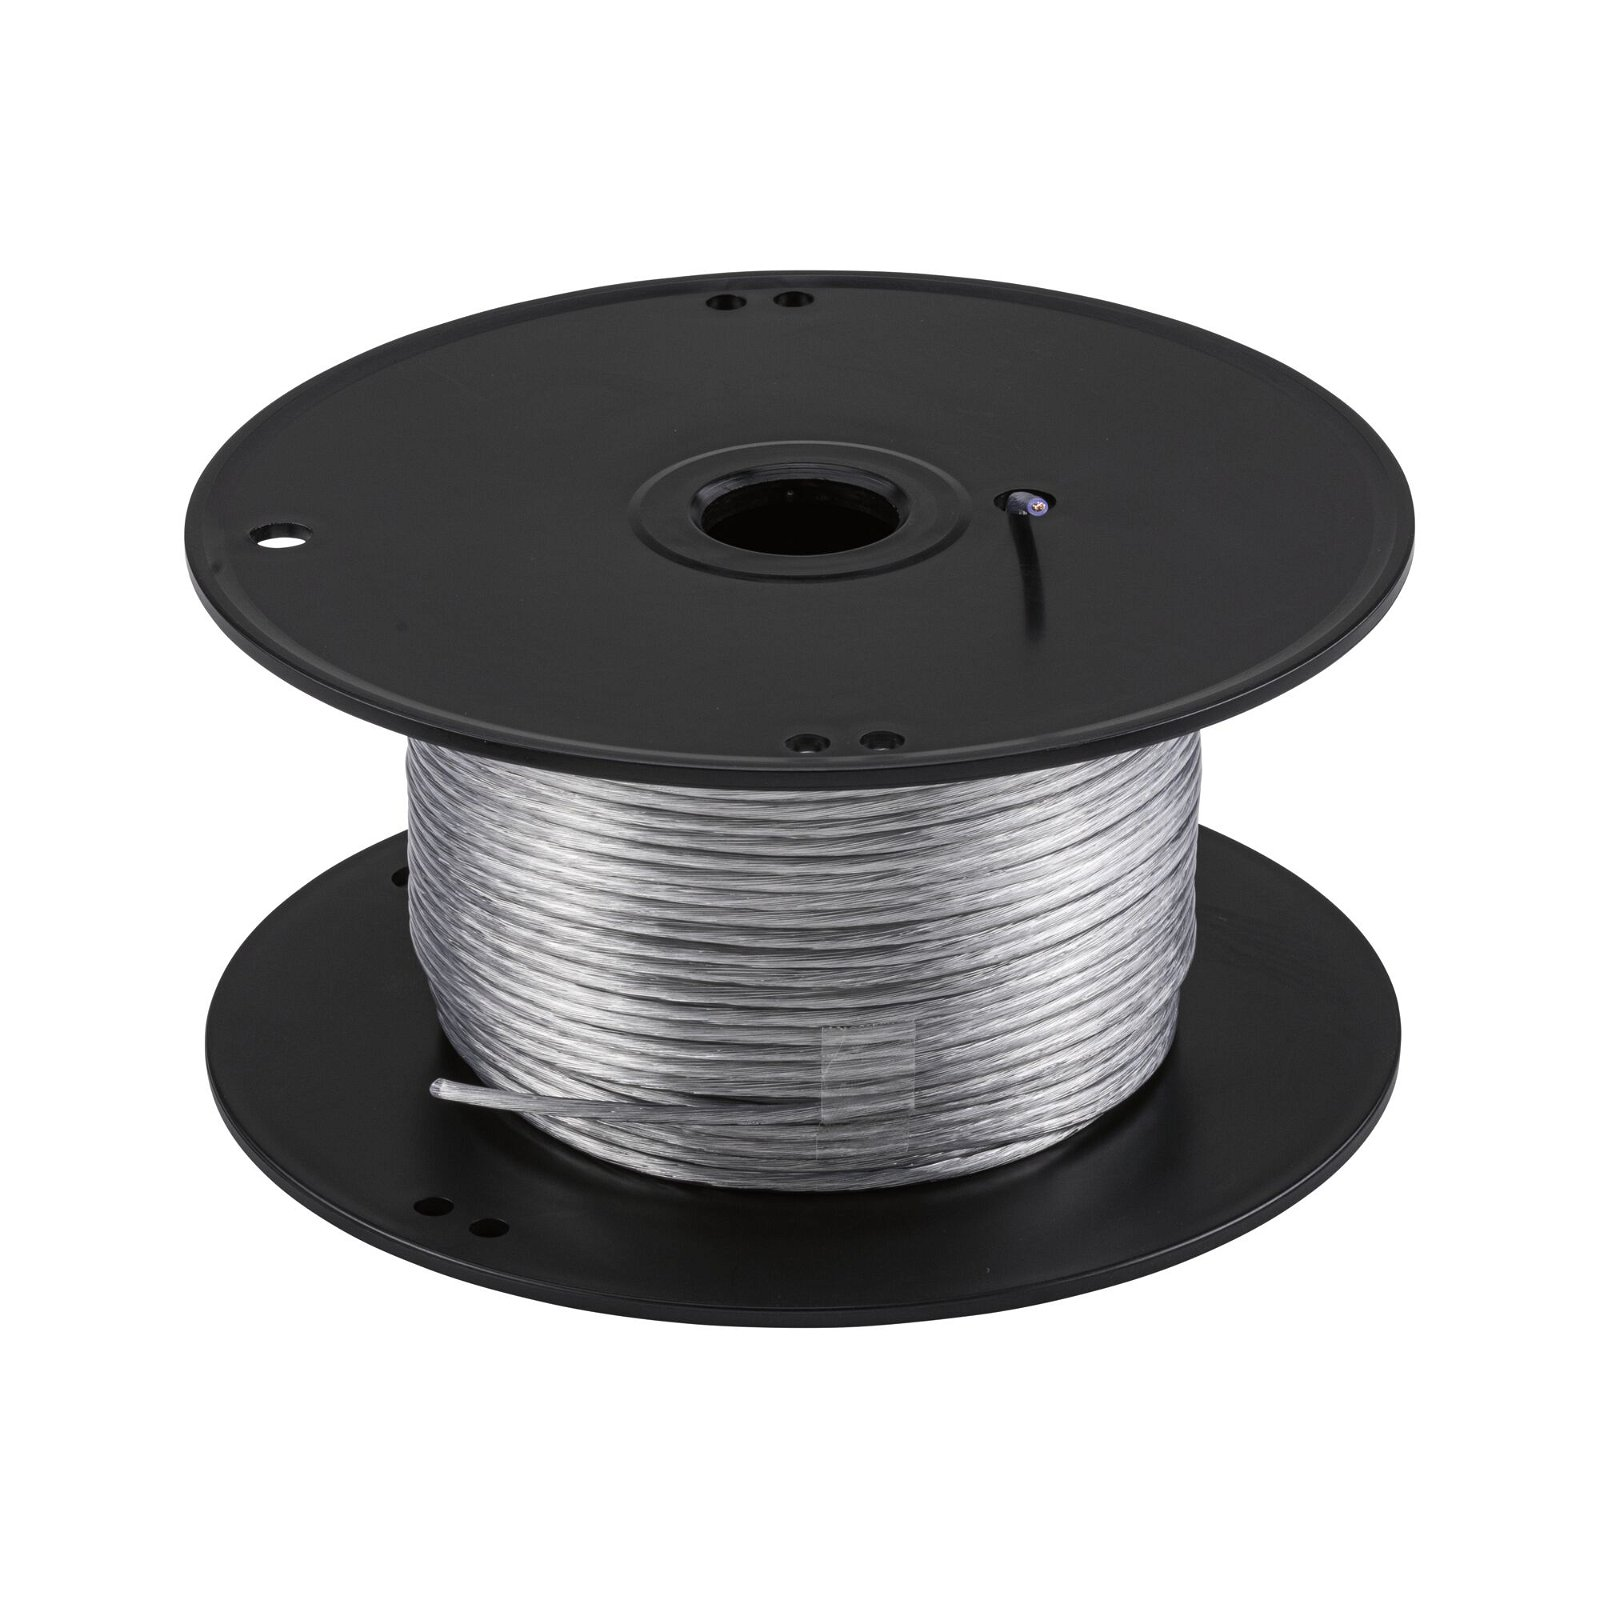 Seilsystem Spannseil Corduo 100m 2,5qmm Transparent